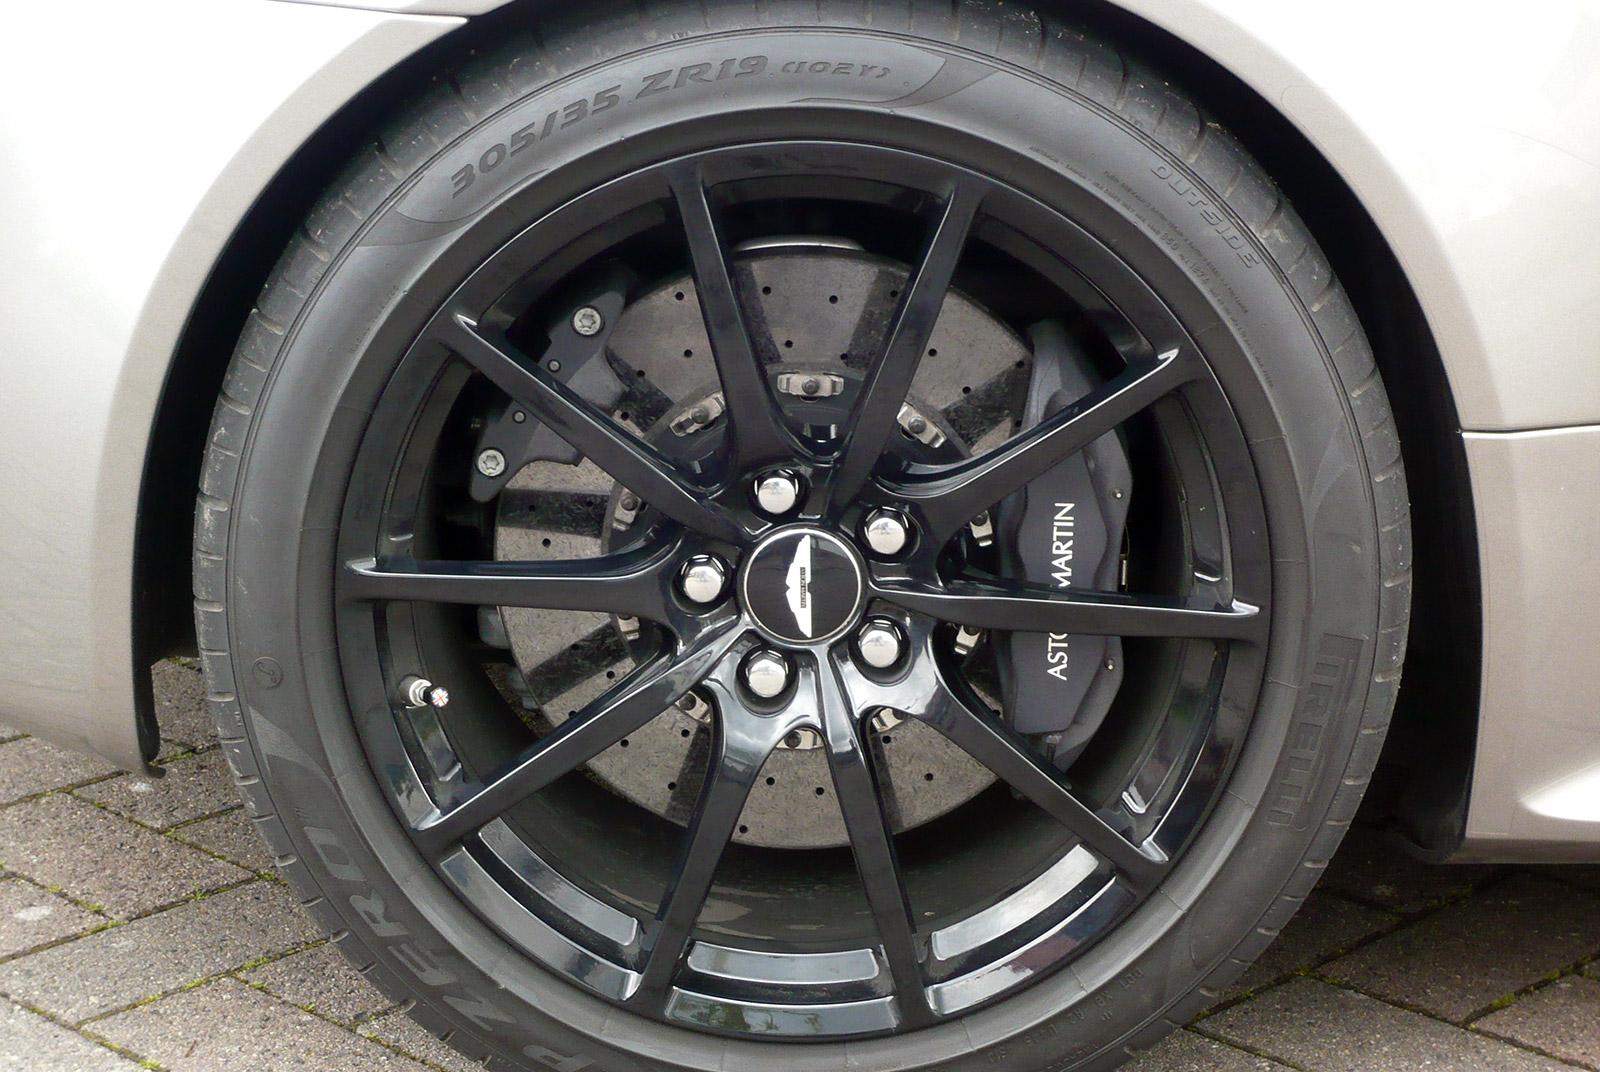 AM-2995-Aston-Martin_V12-Vantage-S_Grau_Schwarz_12